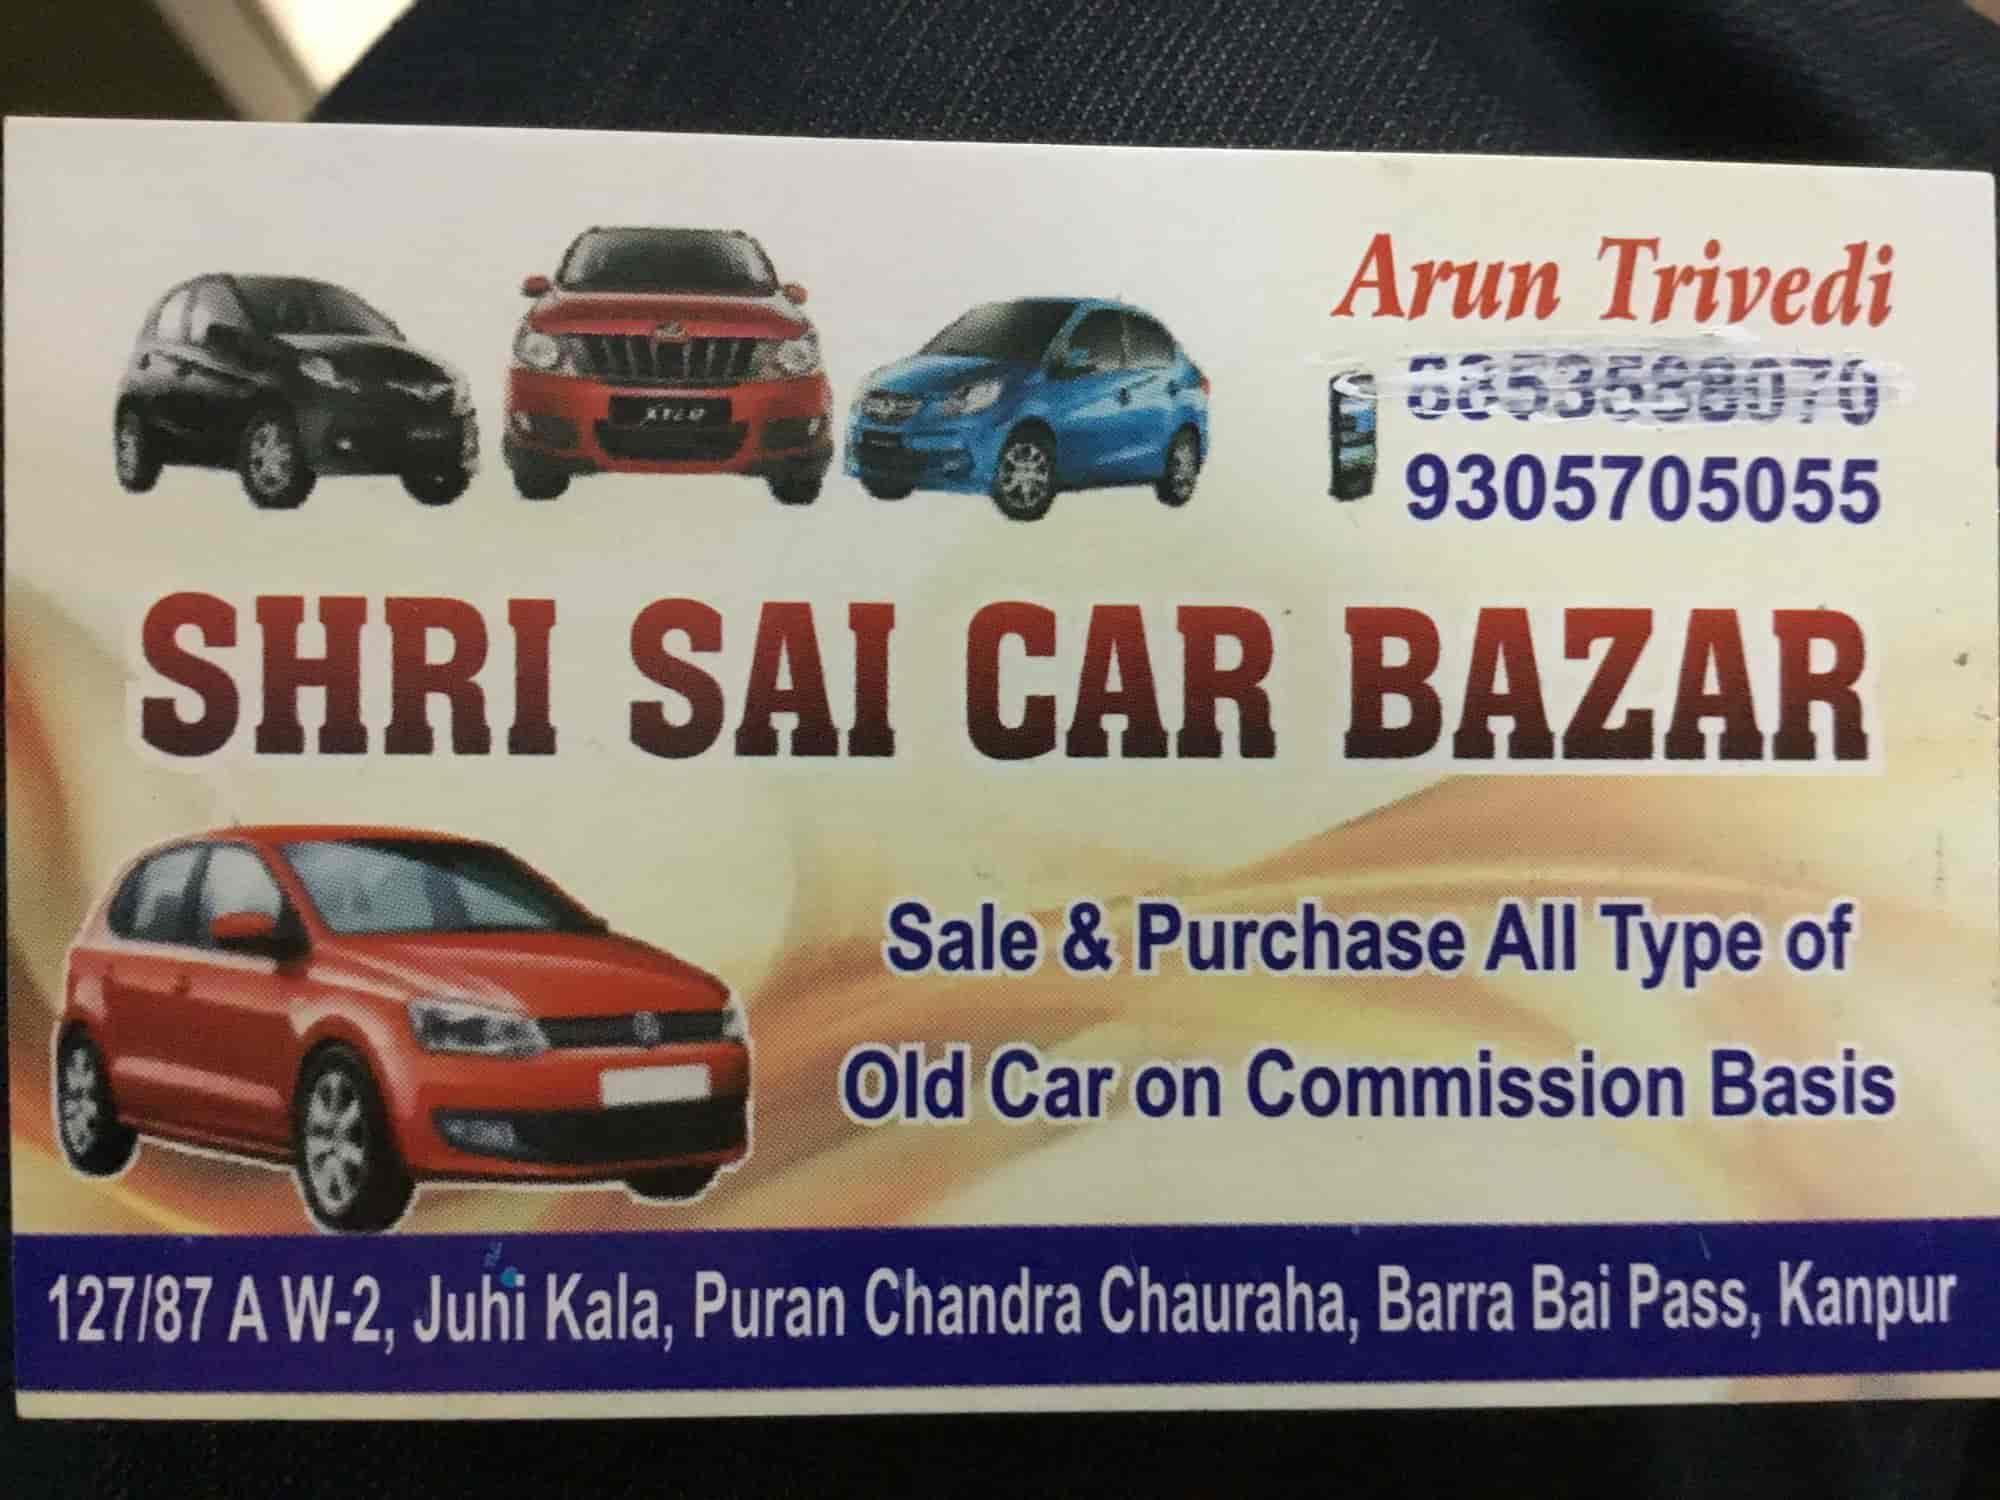 Shri Sai Car Bazar, Barra II - Shri Sai Car Bazaar - Second Hand Car ...